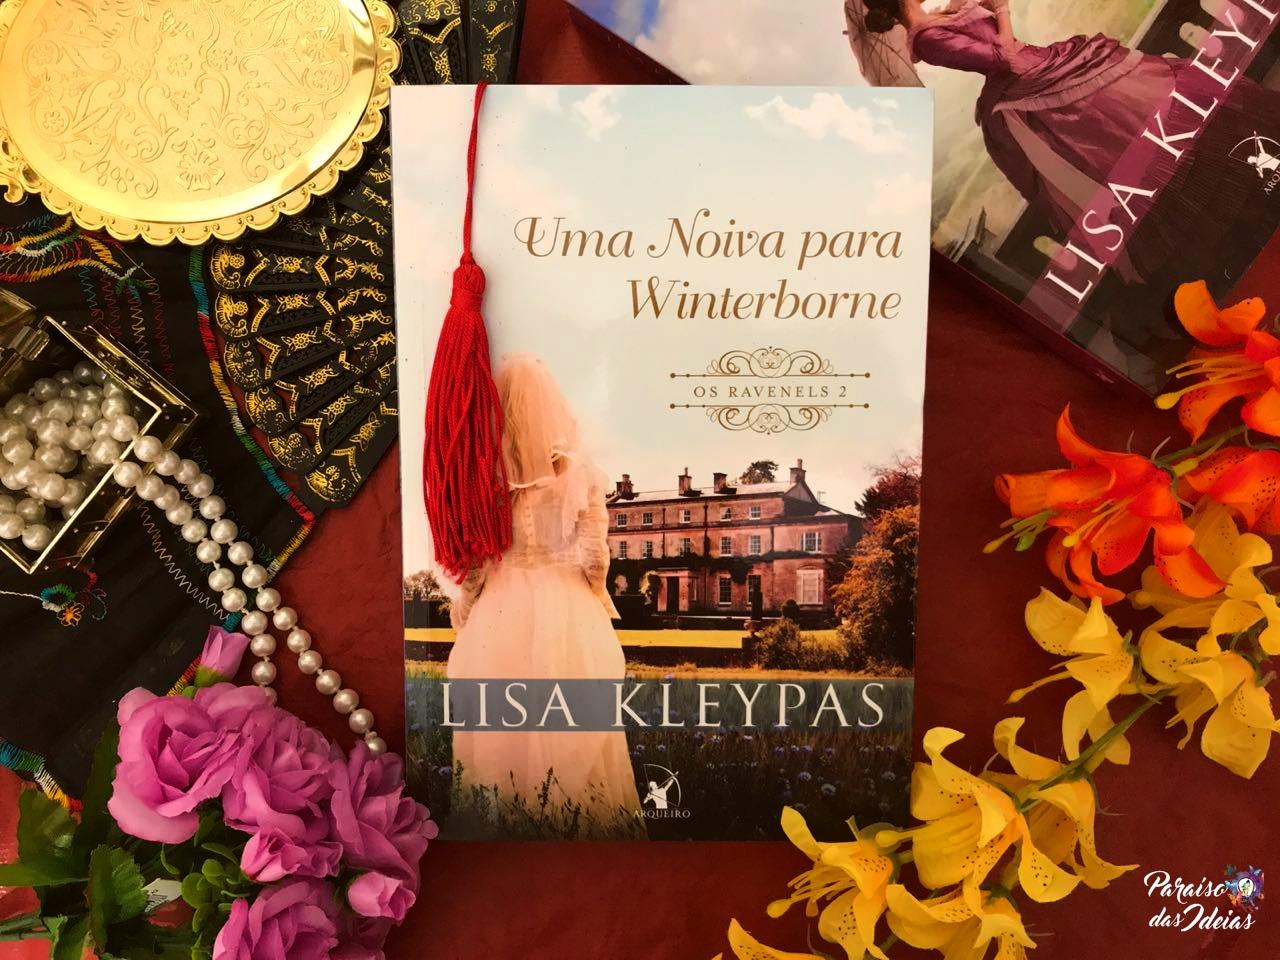 [Resenha] Uma Noiva para Winterborne #02 - Lisa Kleypas